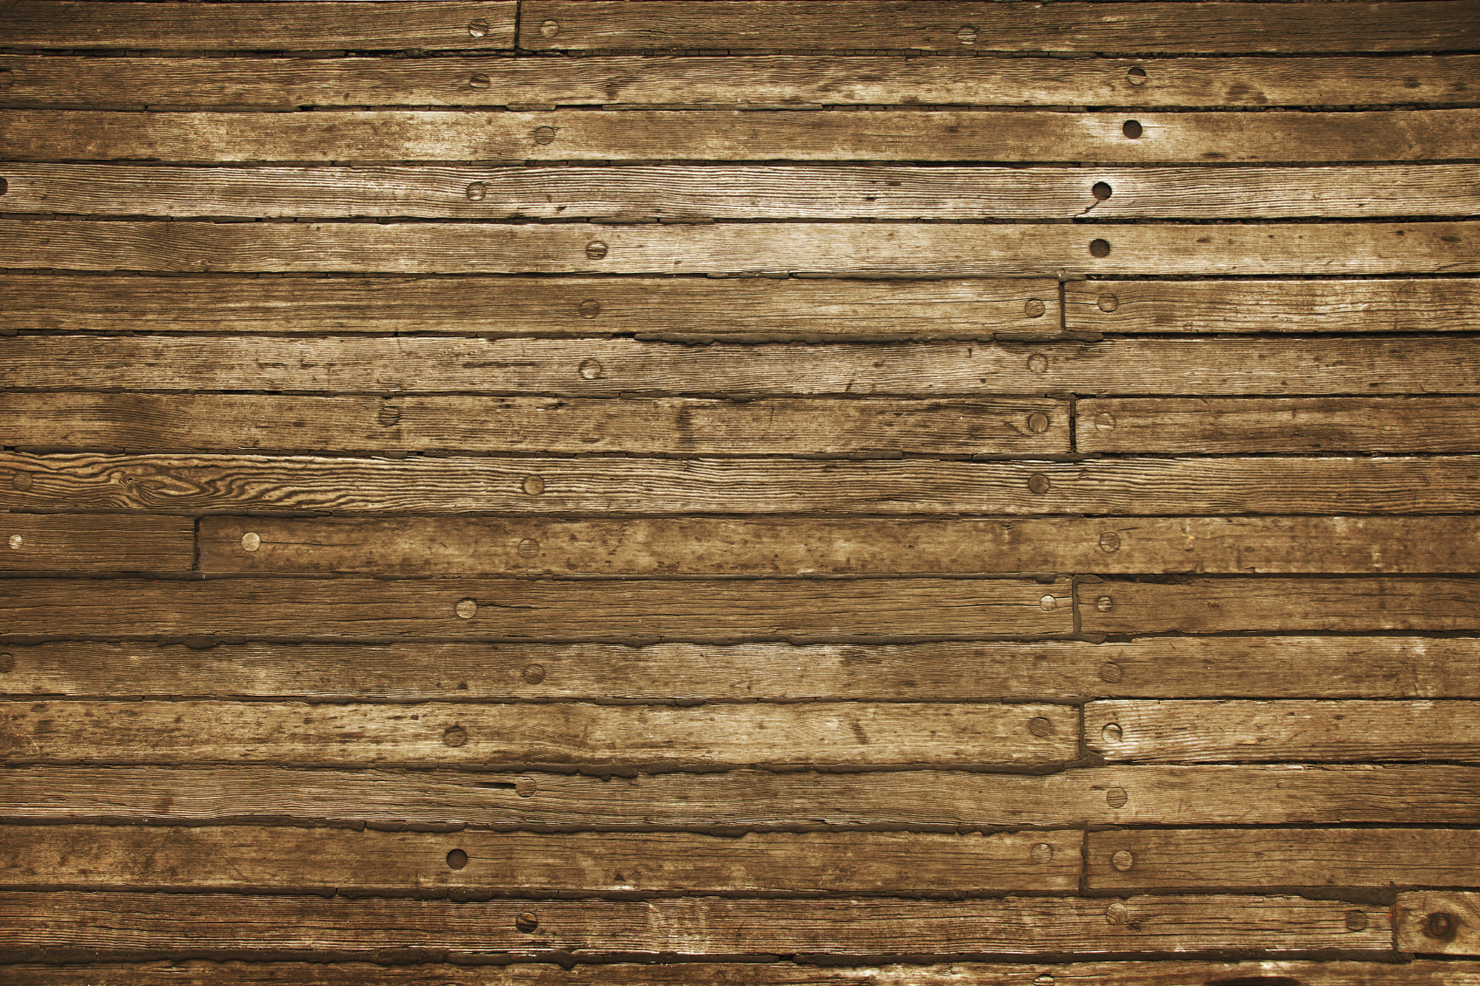 Wood Grain Web Png Row House Cafe . #54518.